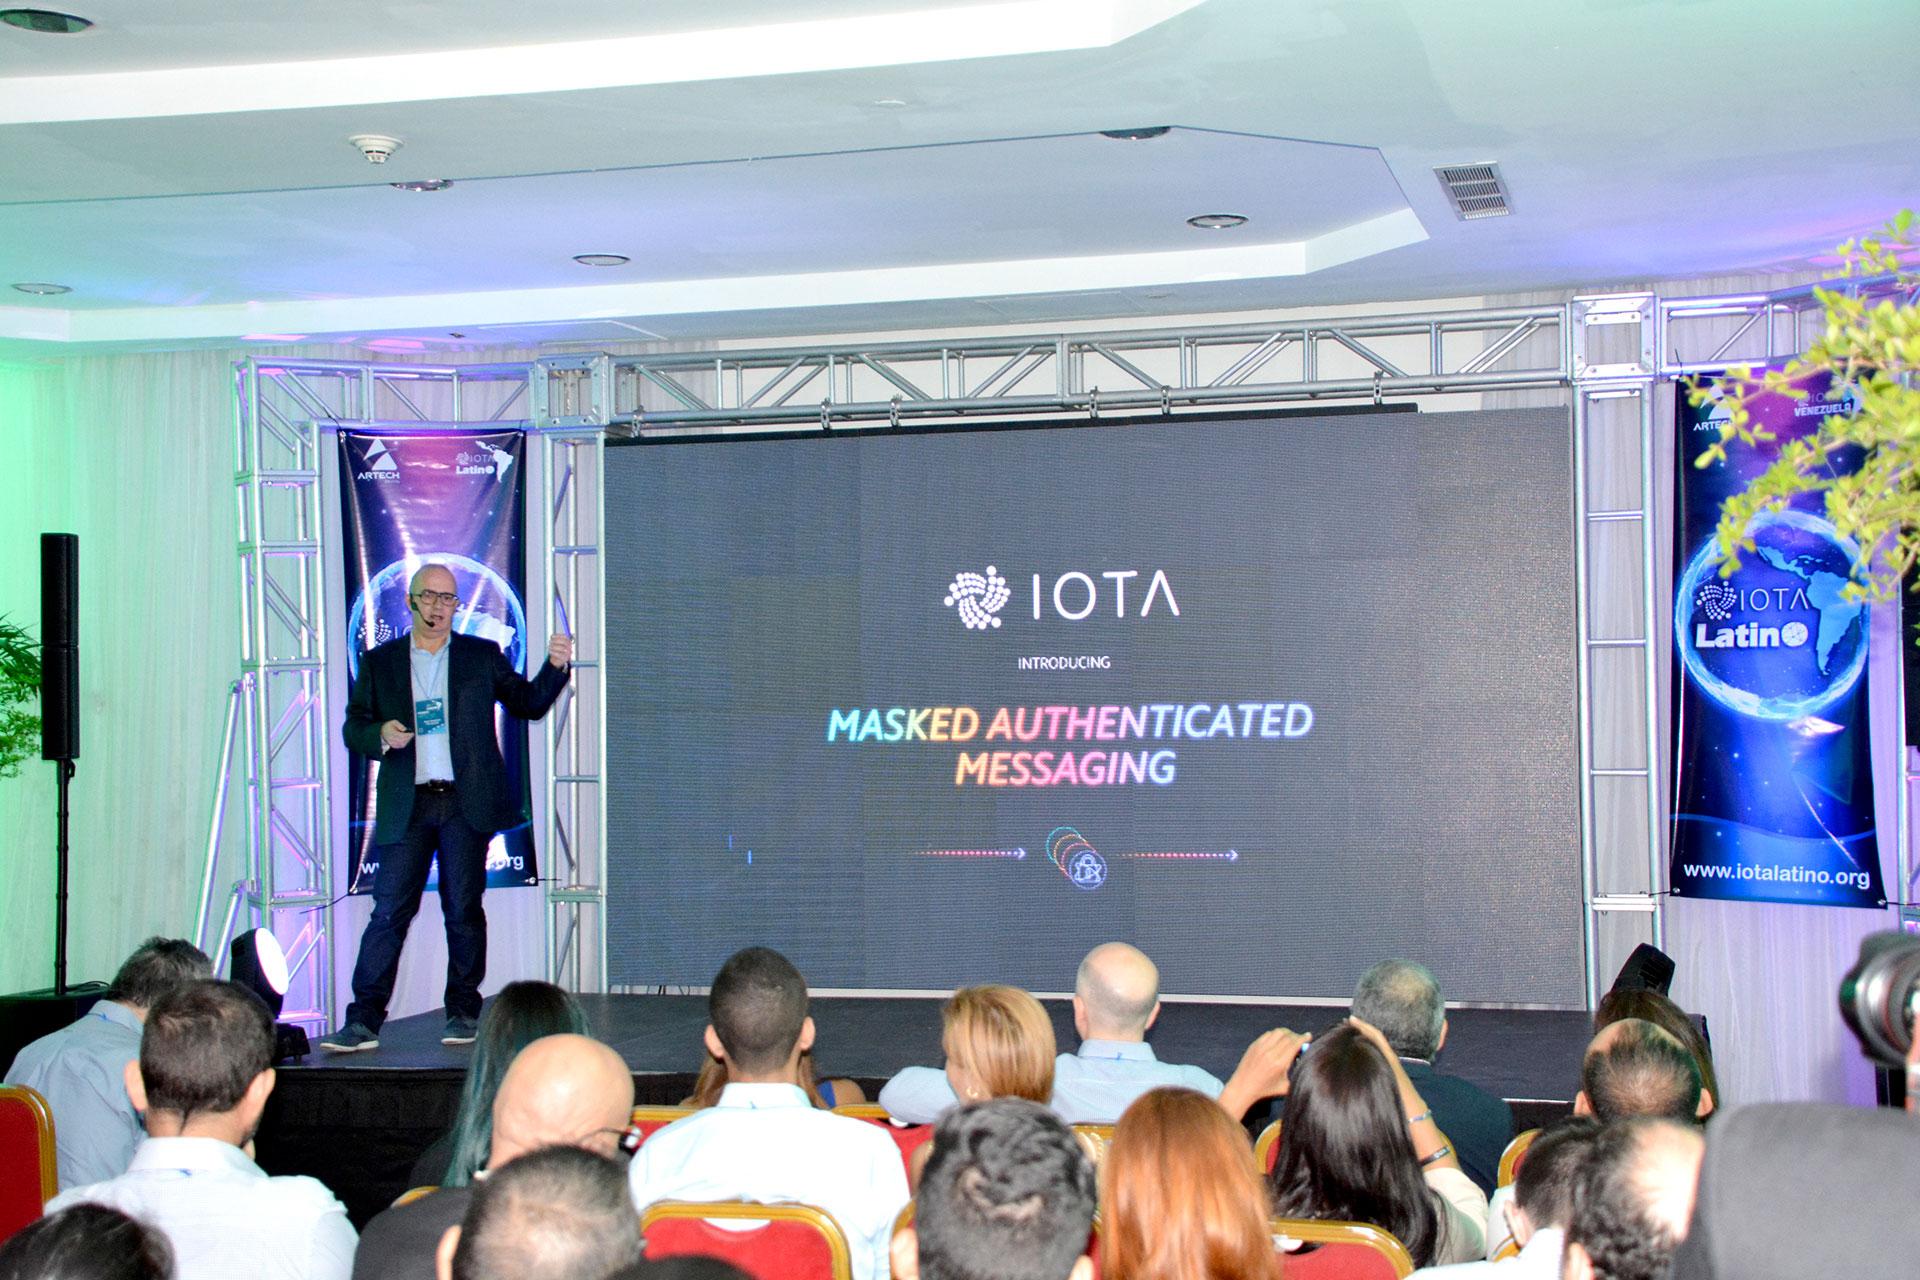 primer meetup de IOTA en Venezuela - Saul Ameliach - 7